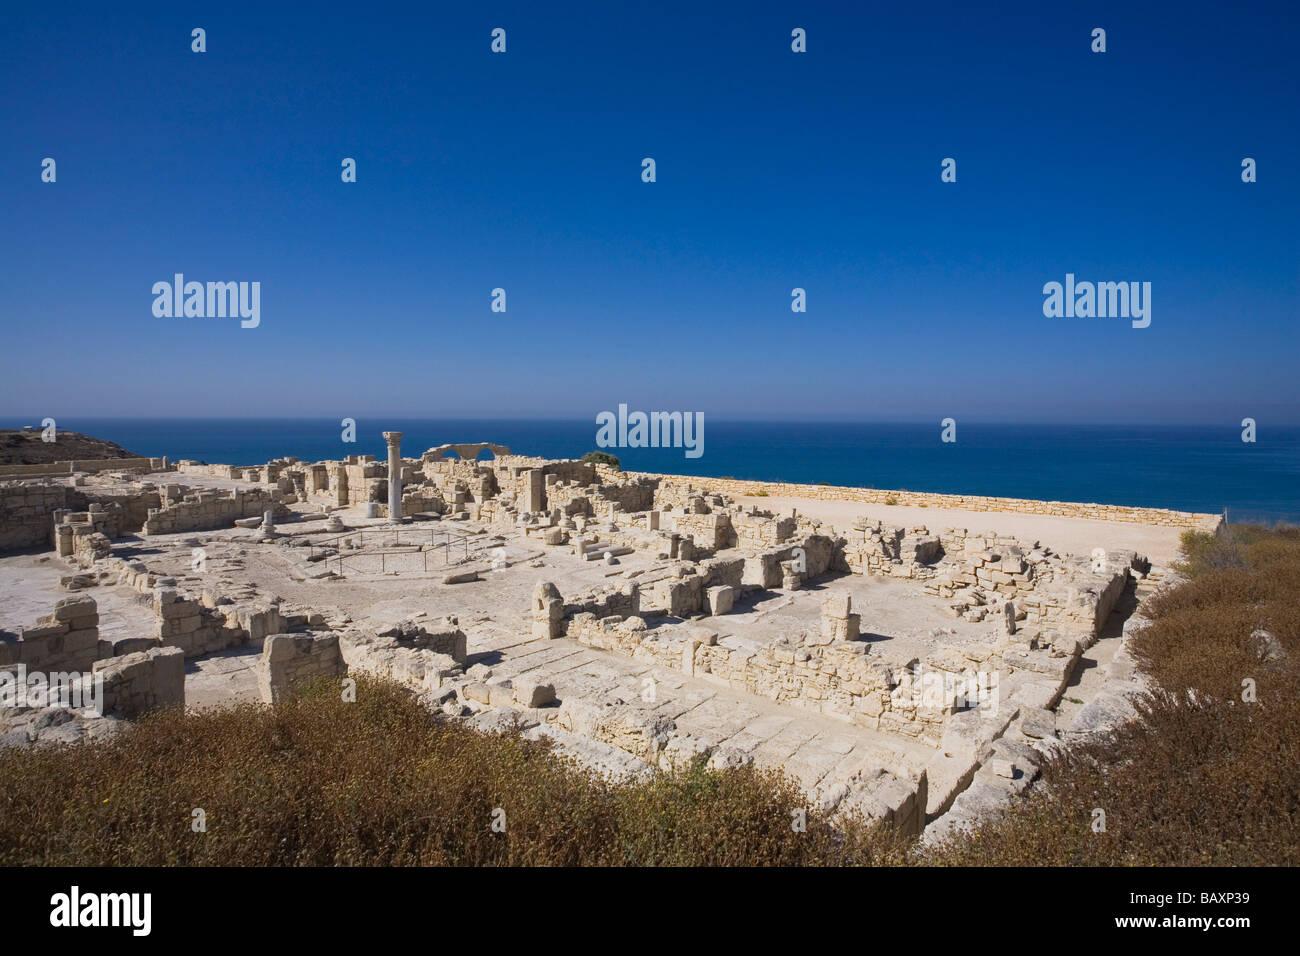 Ruins of an early Christian Basilica, ancient city of Kourion, Kourion, South Cyprus, Cyprus - Stock Image